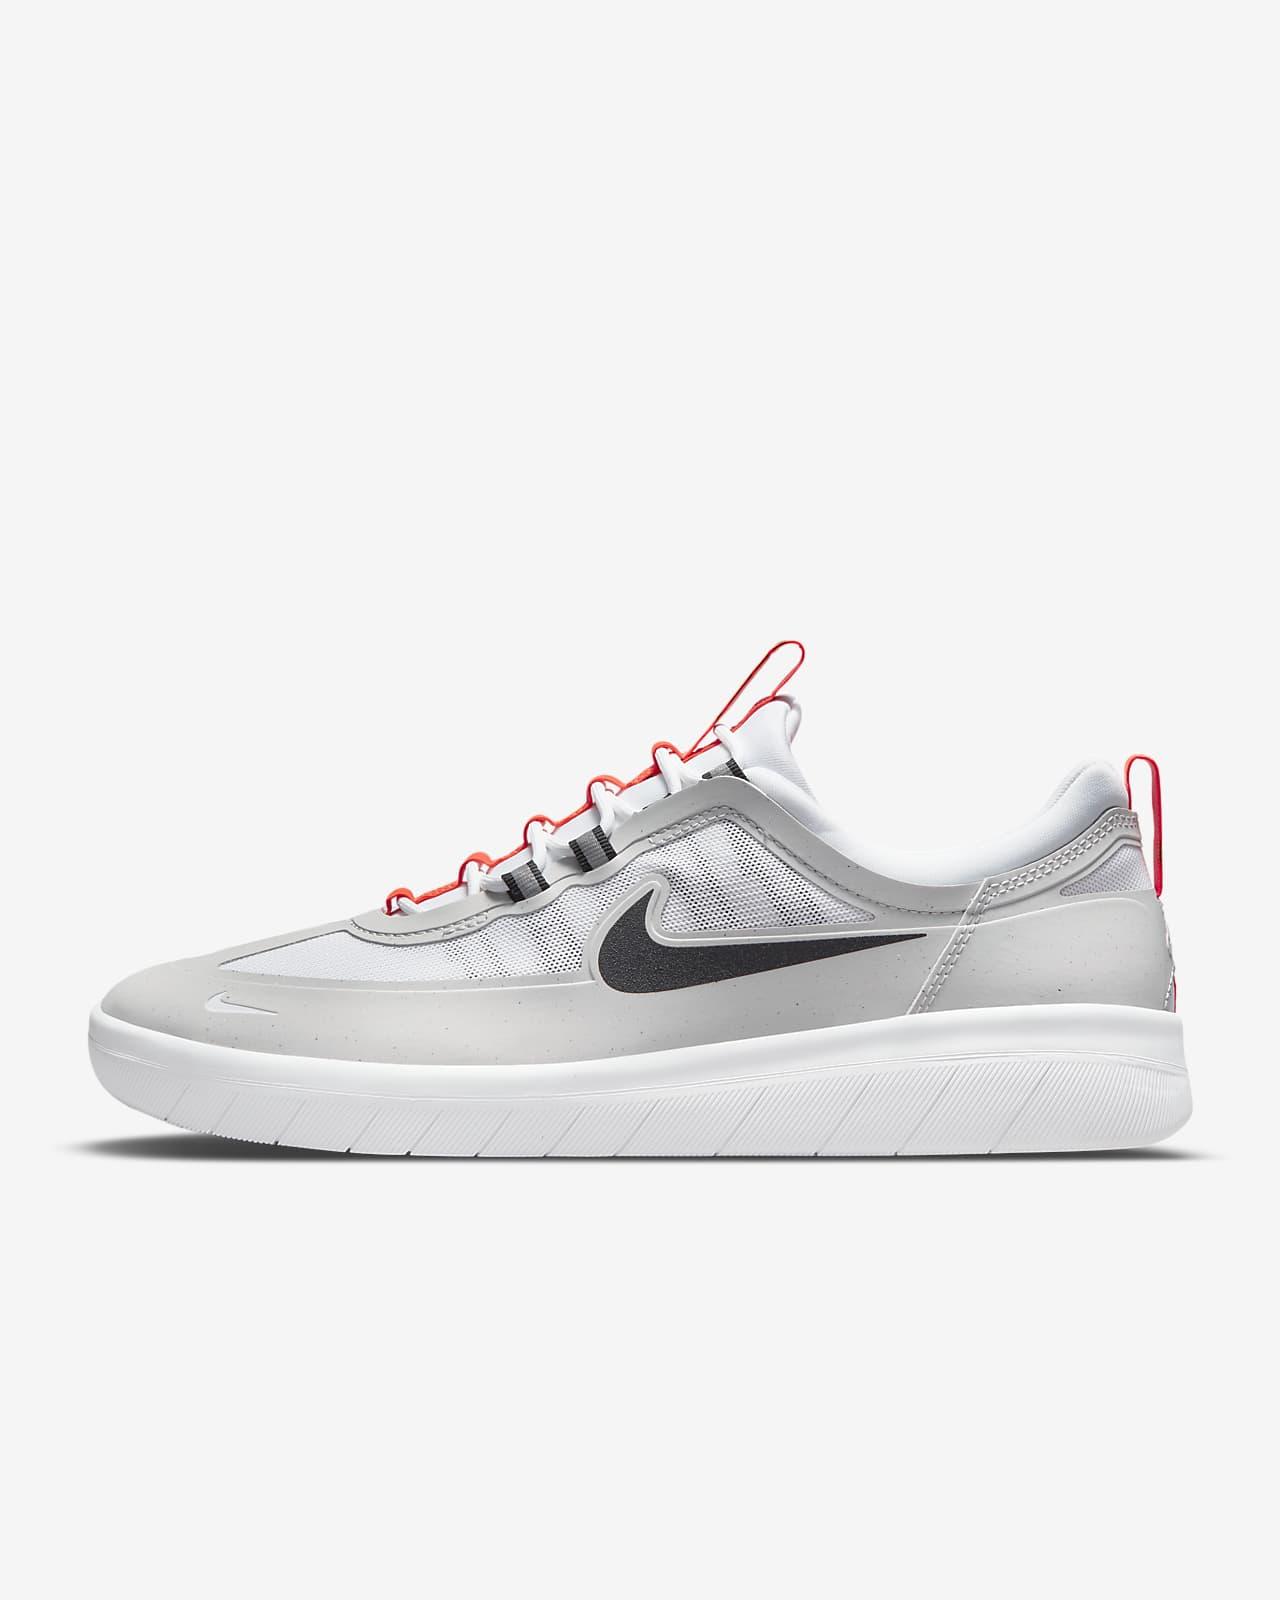 Skateboardsko Nike SB Nyjah Free 2